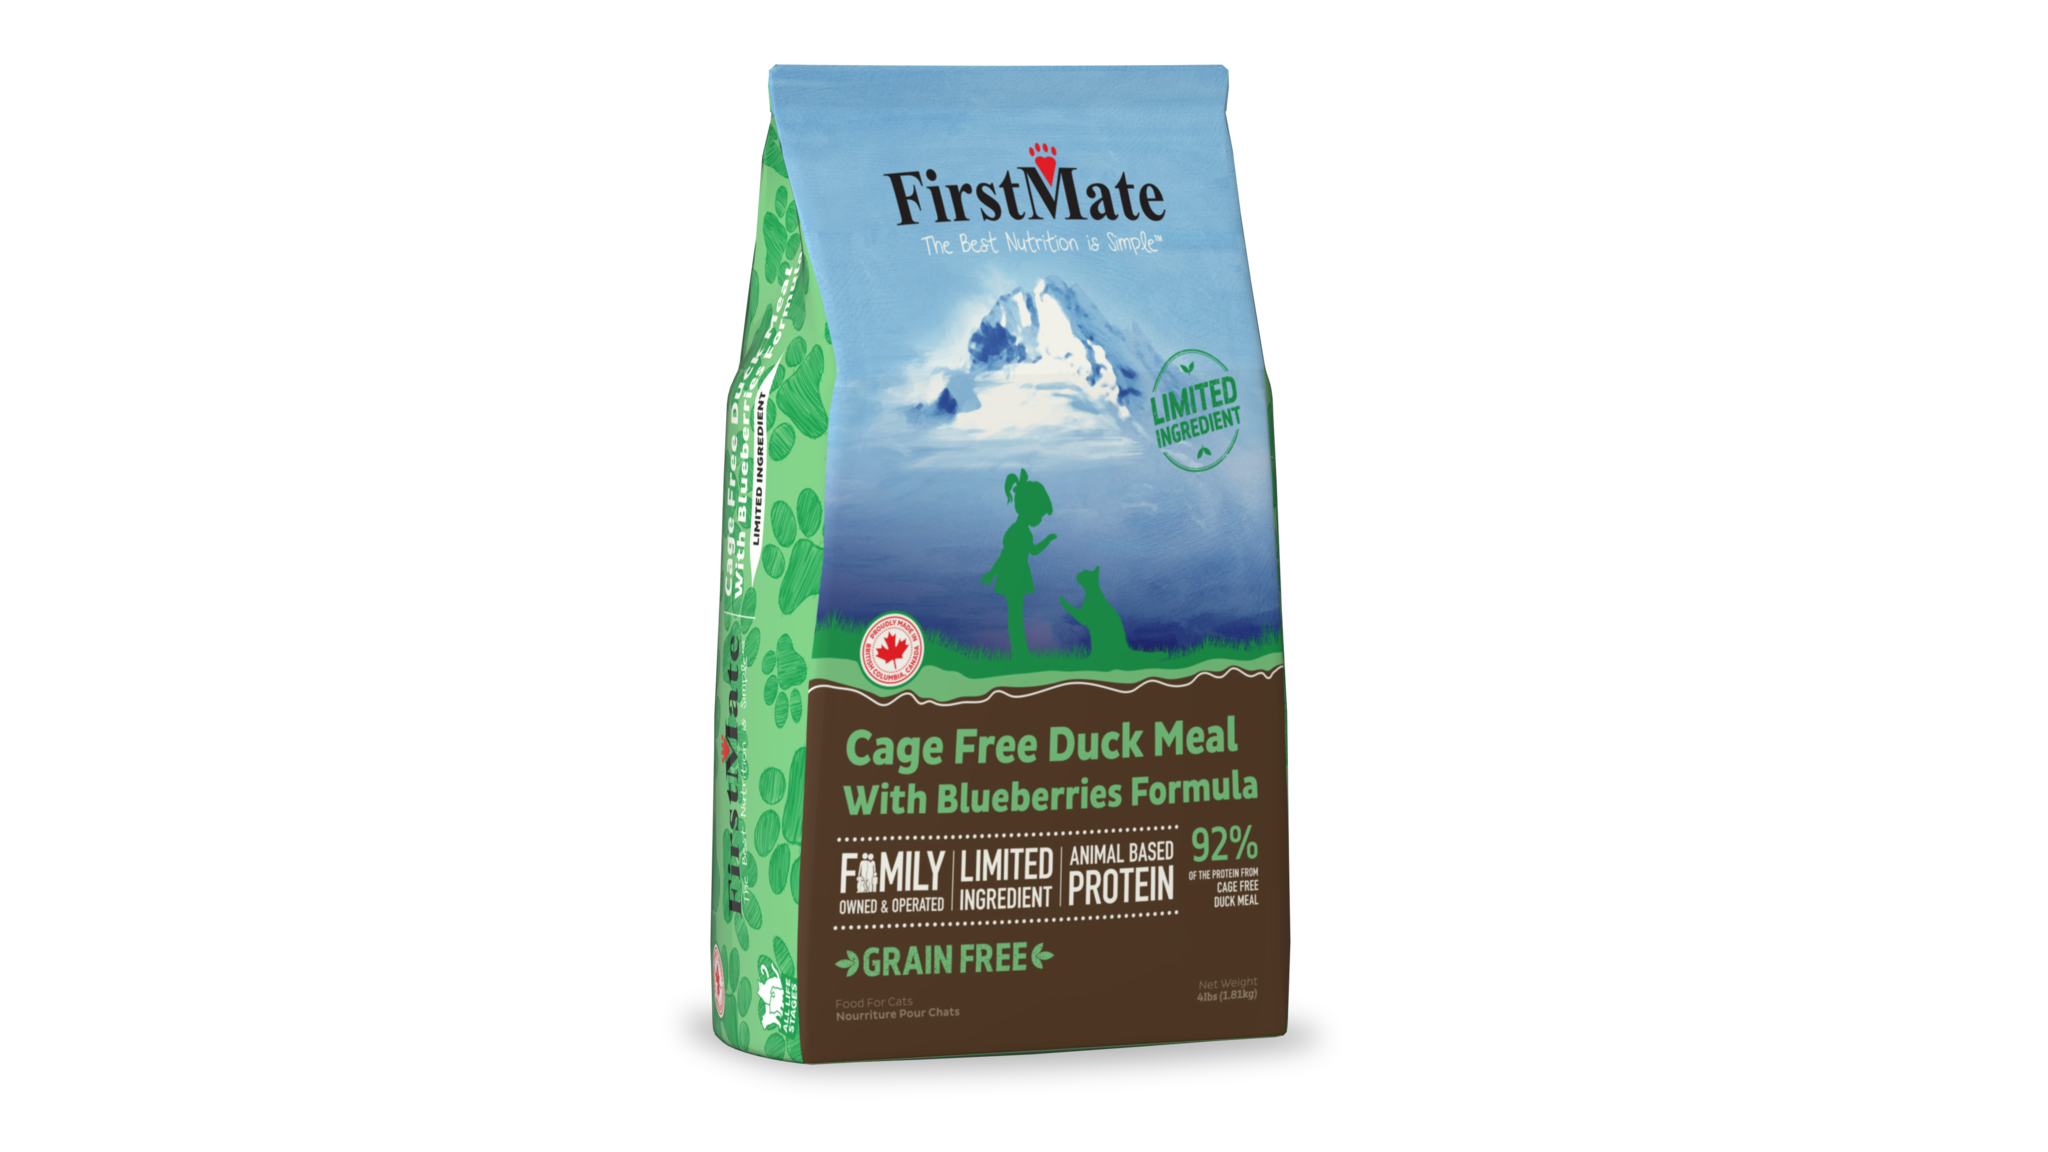 FirstMate FirstMate Duck & Blueberries Dry Cat Food